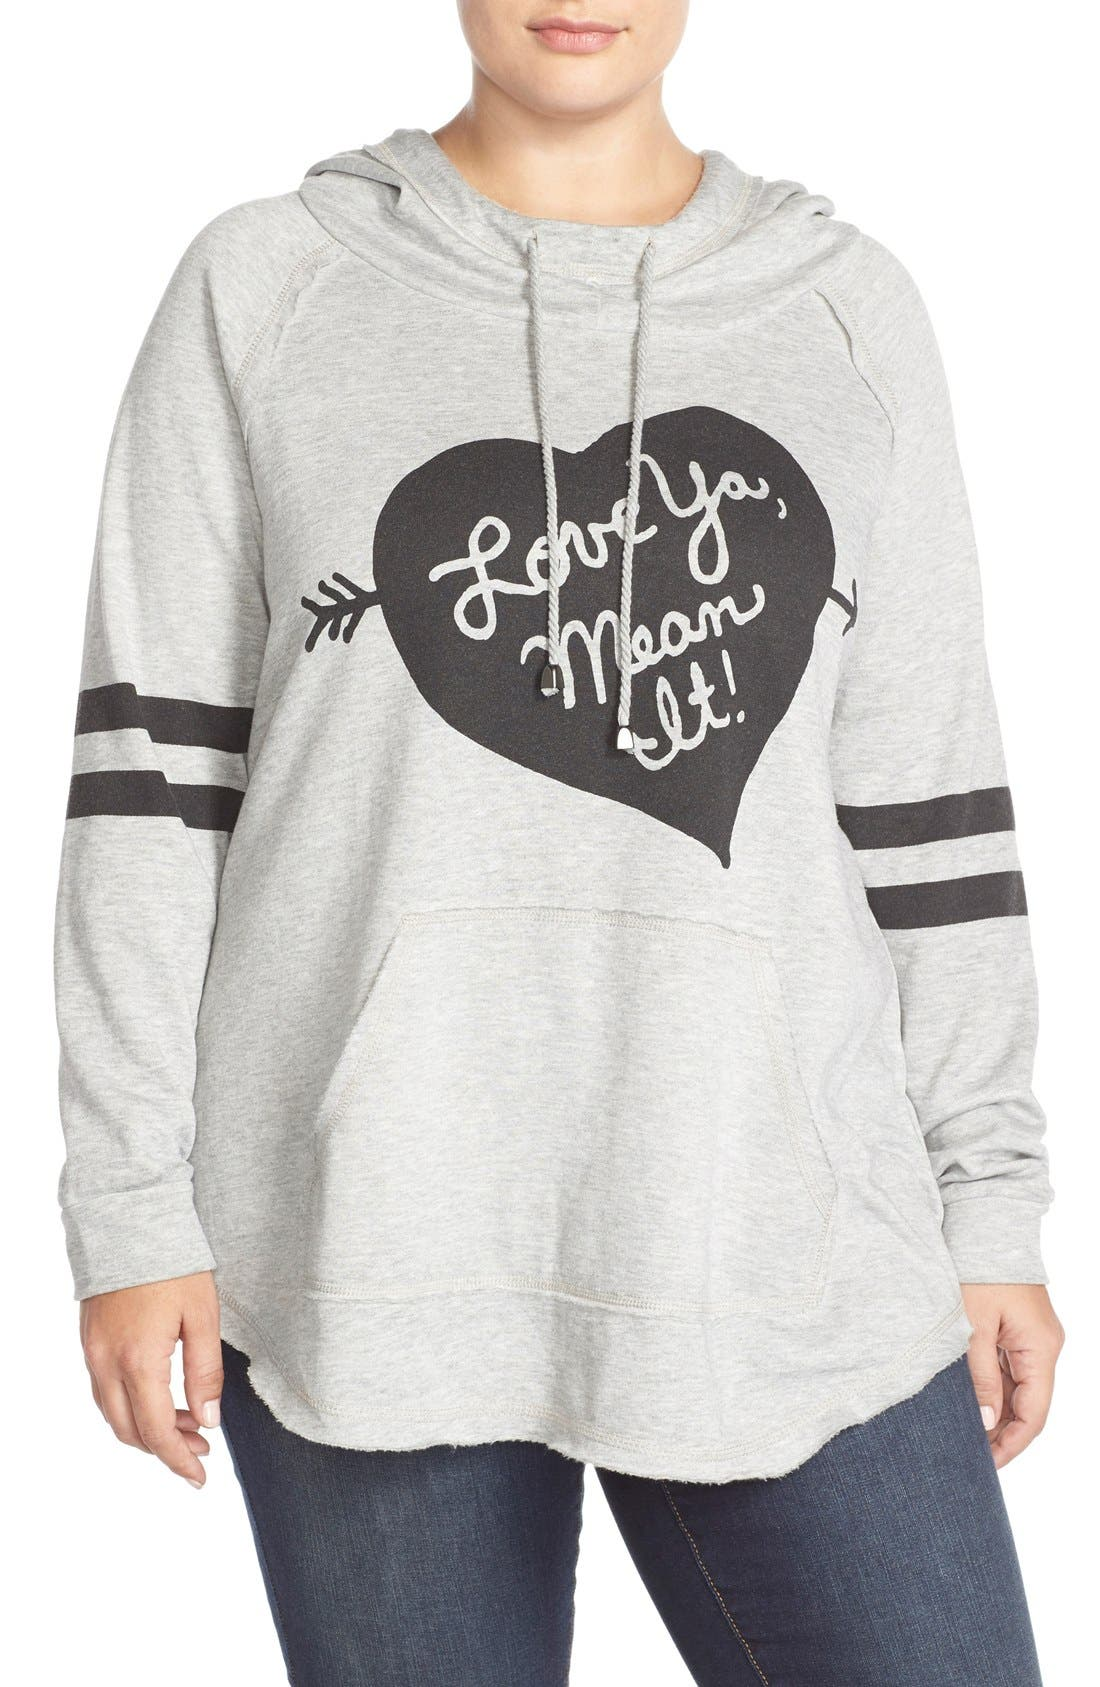 'Love Ya, Mean It' Hooded Sweatshirt,                             Main thumbnail 1, color,